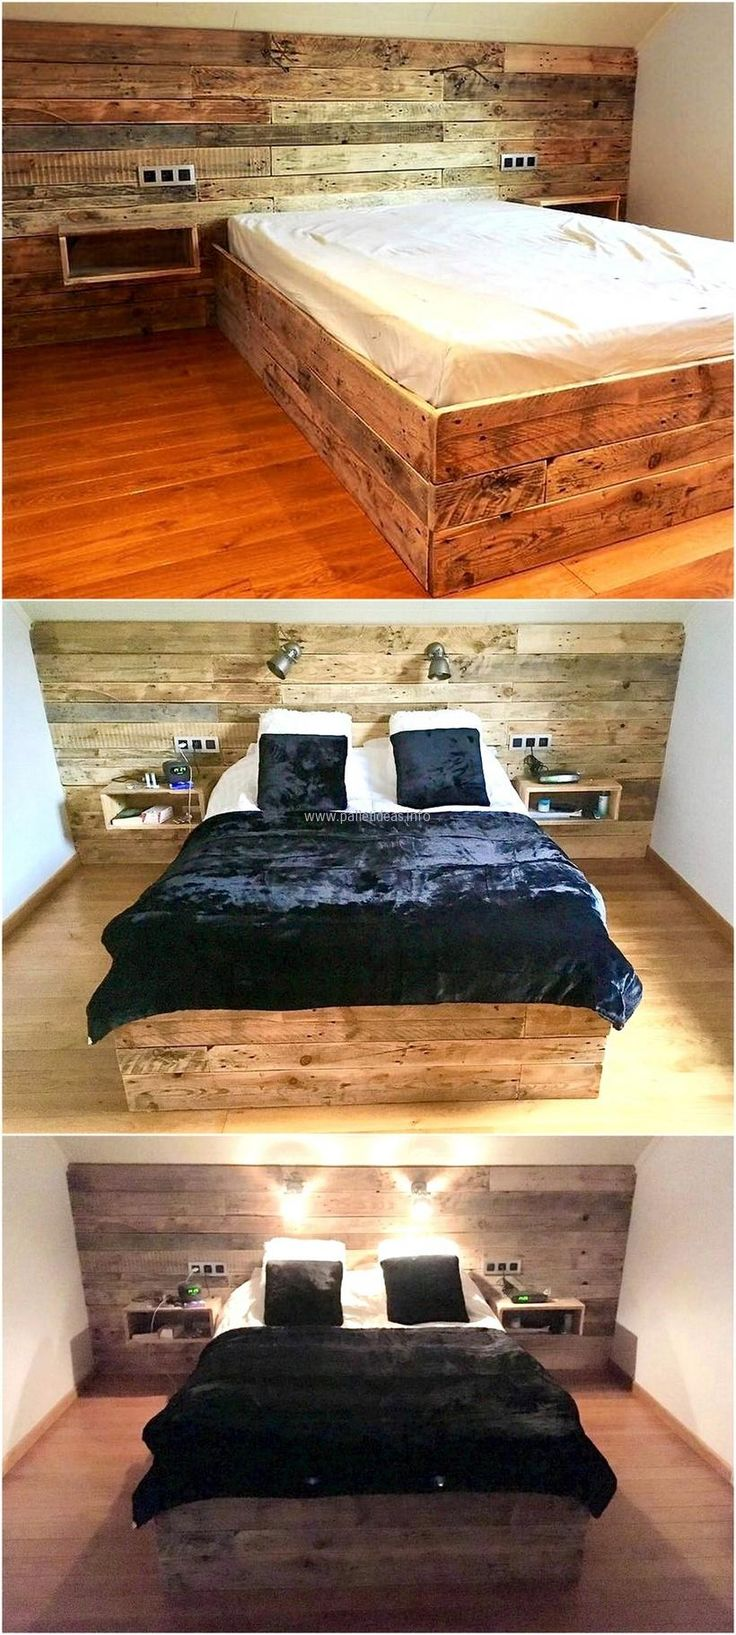 Designs for beds wood bed frame designs wood bed frame - Easy To Make Wood Pallet Furniture Ideas